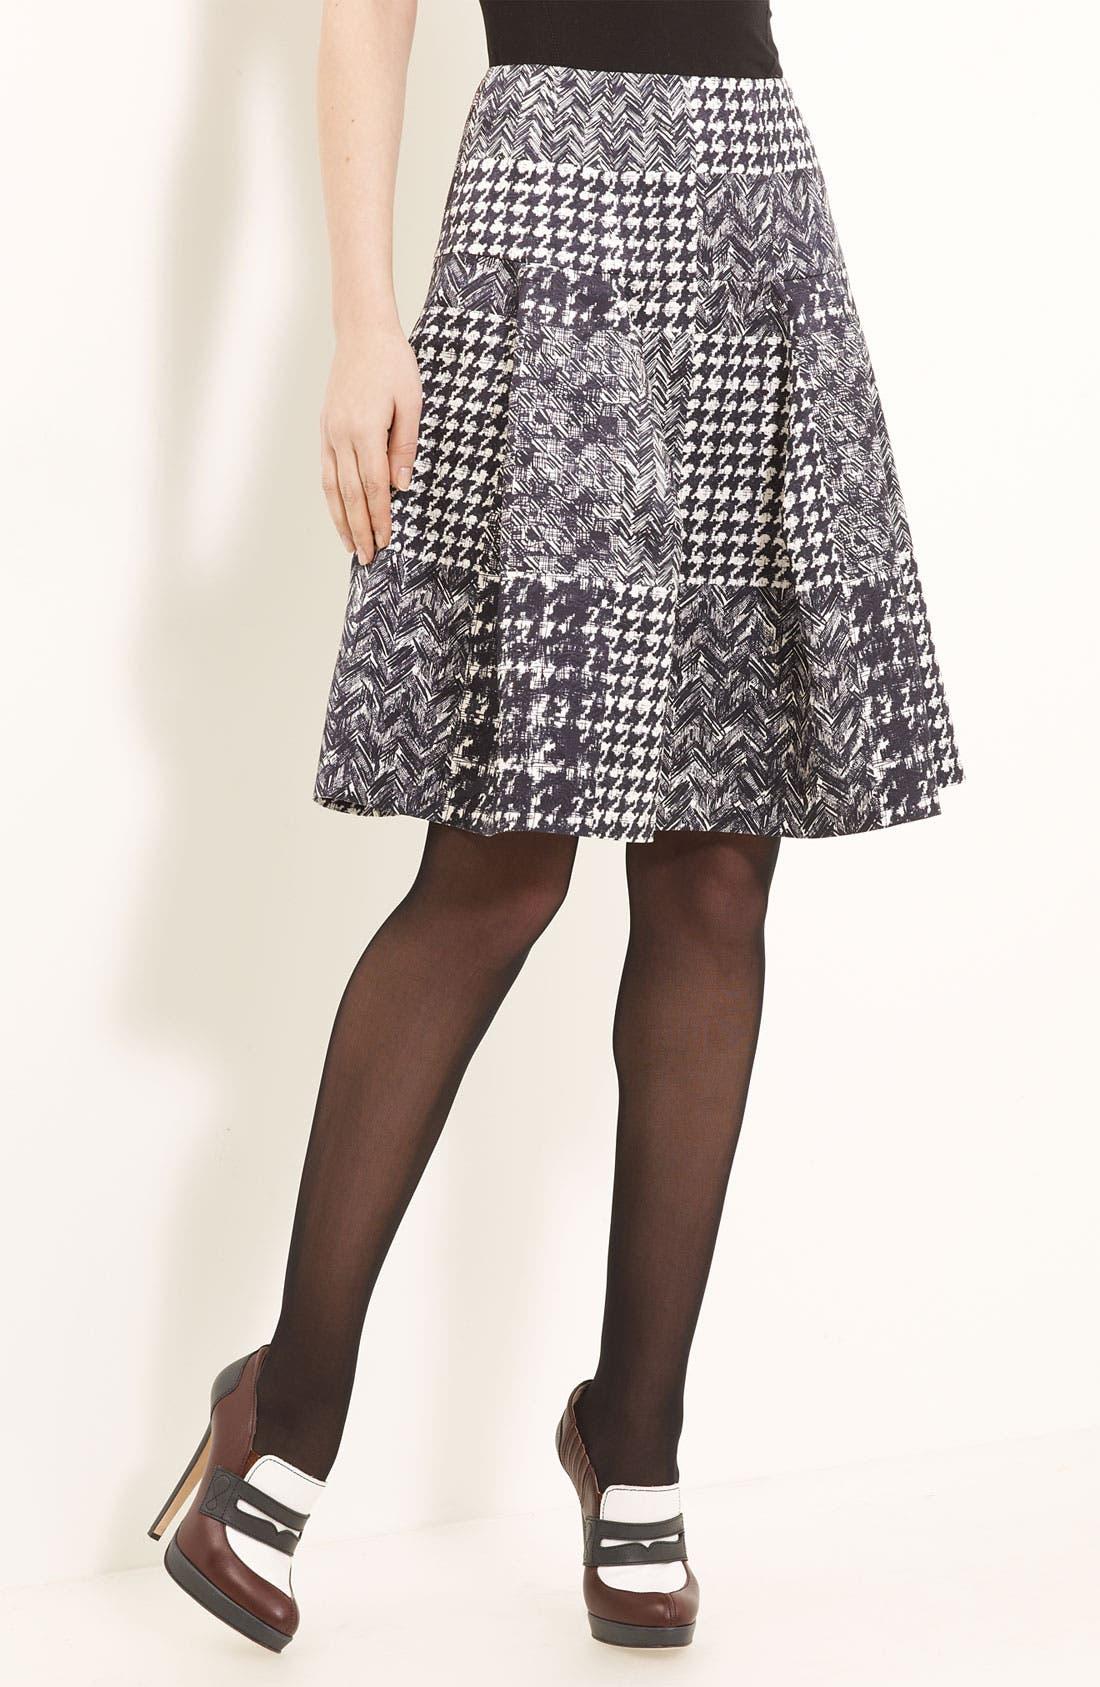 Alternate Image 1 Selected - Oscar de la Renta Tweed & Matelassé Patchwork Skirt